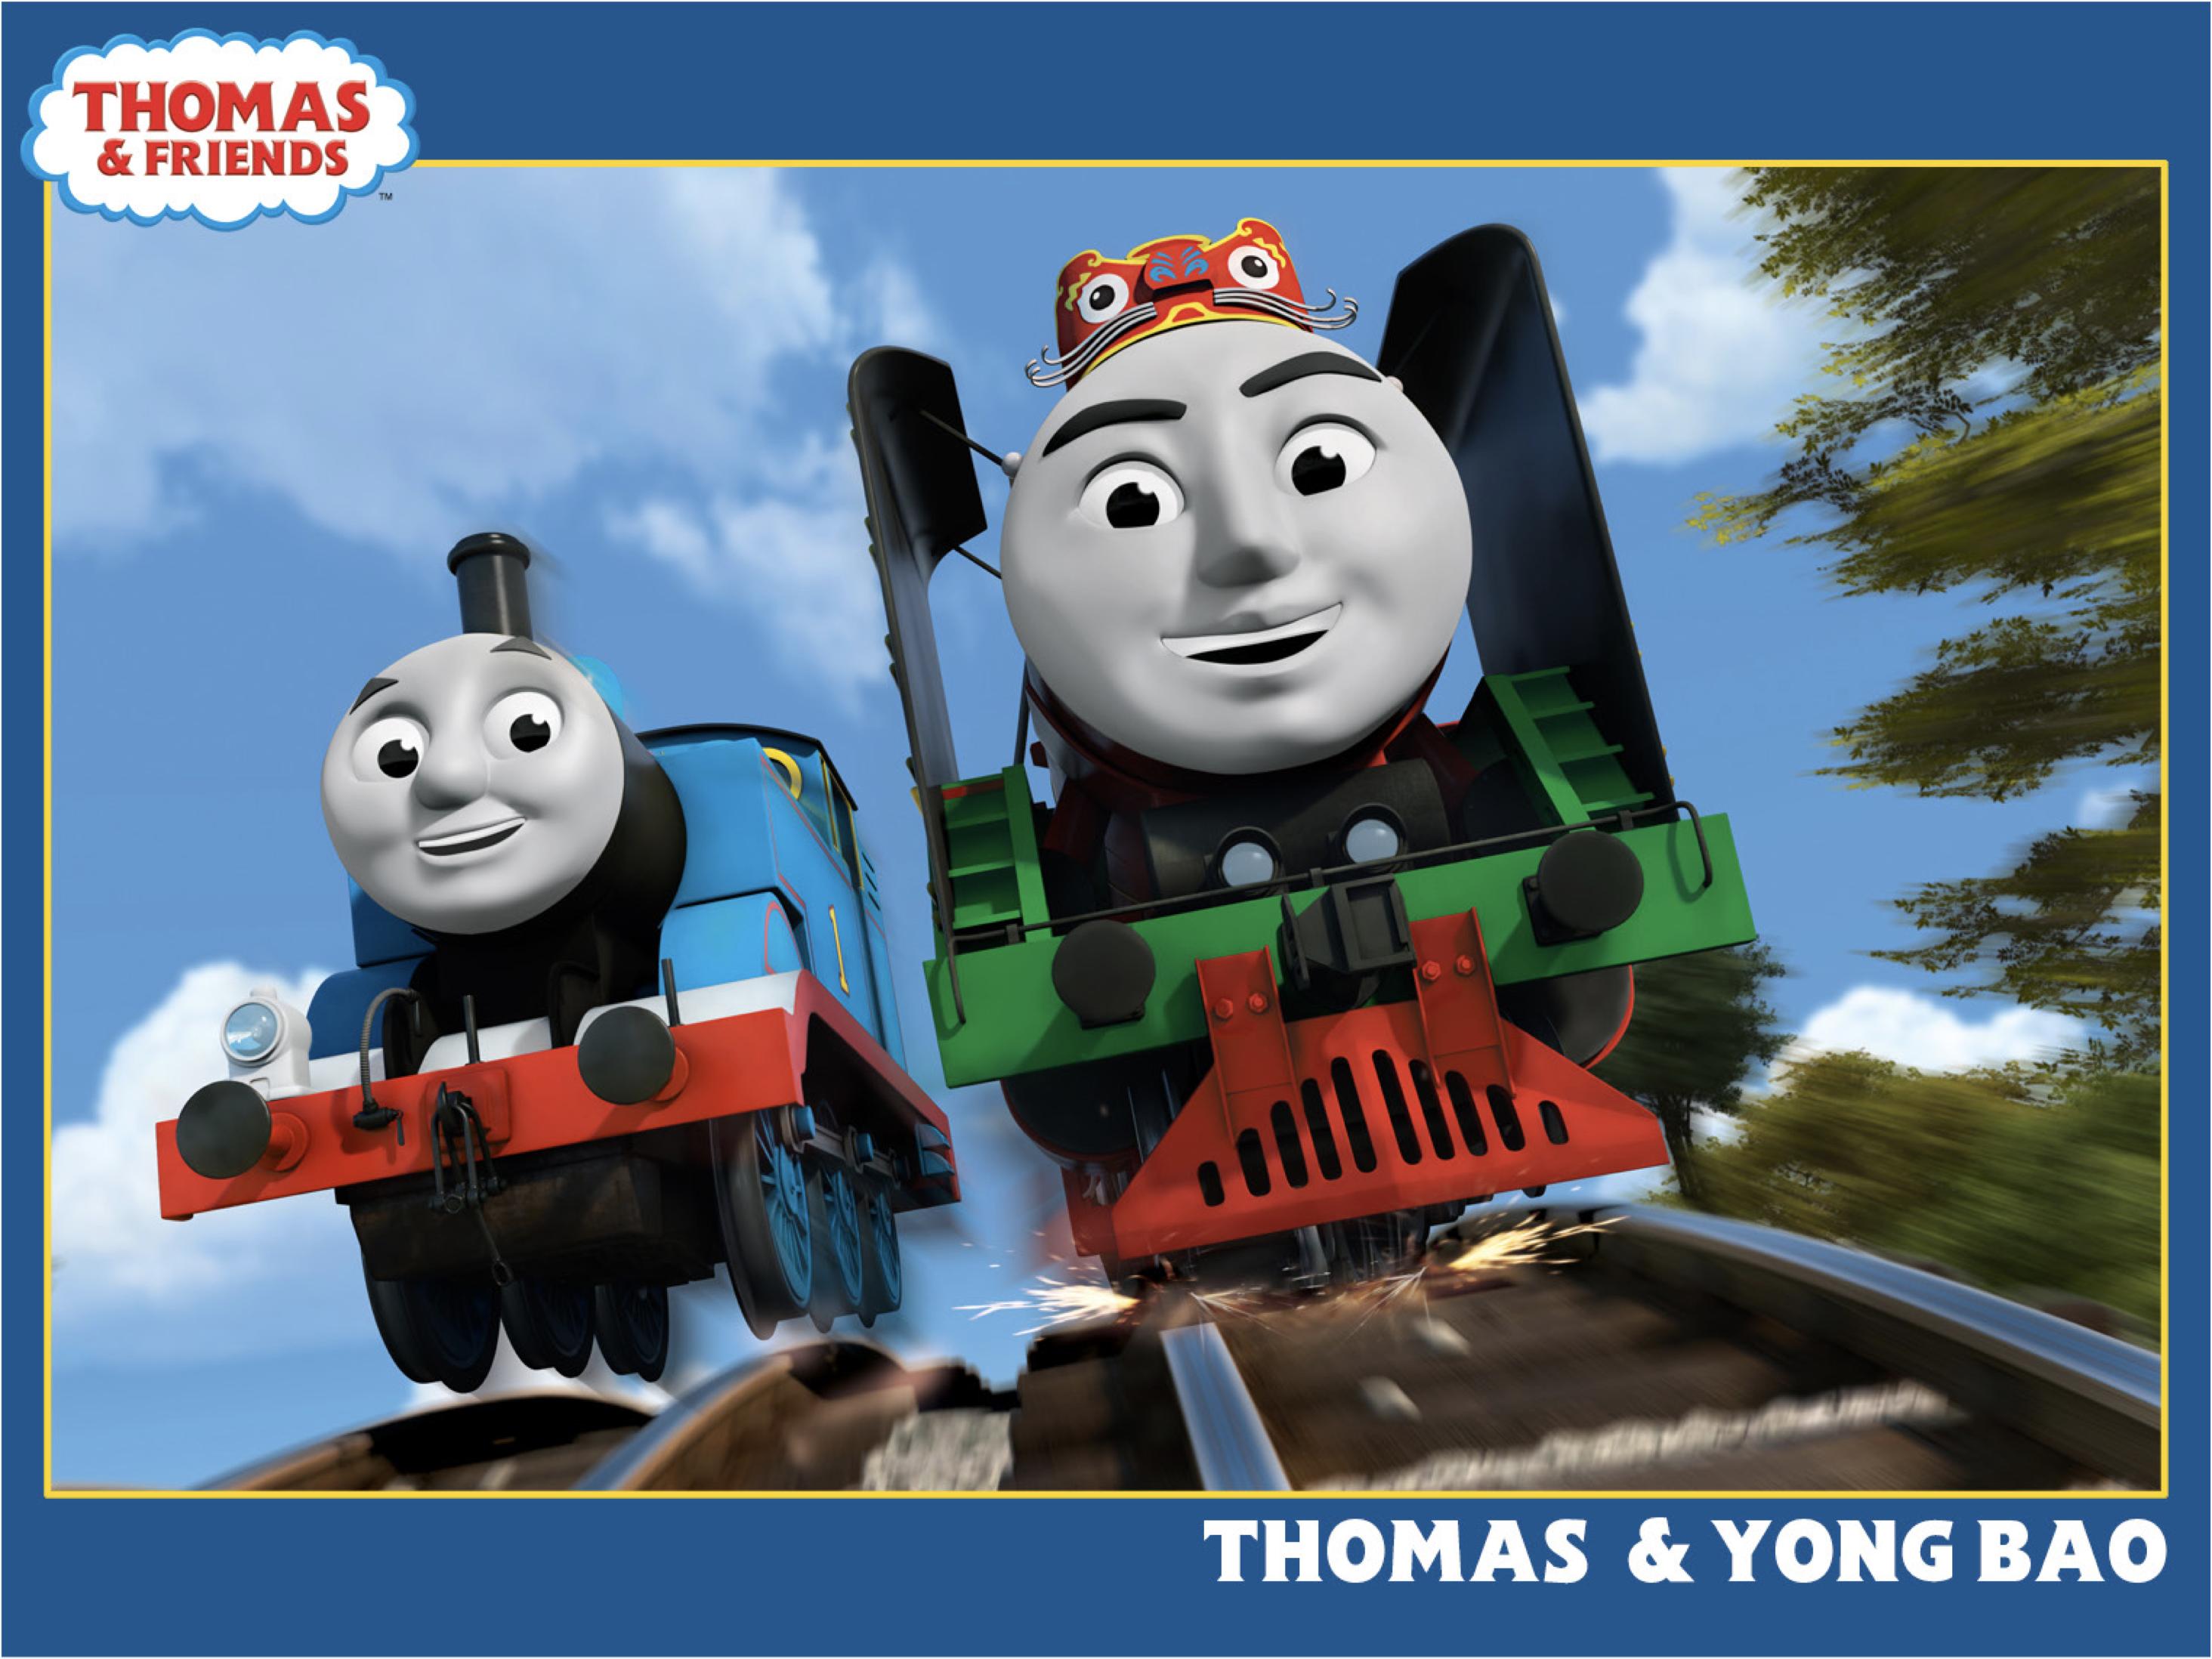 File:Thomas & Yong Bao.png